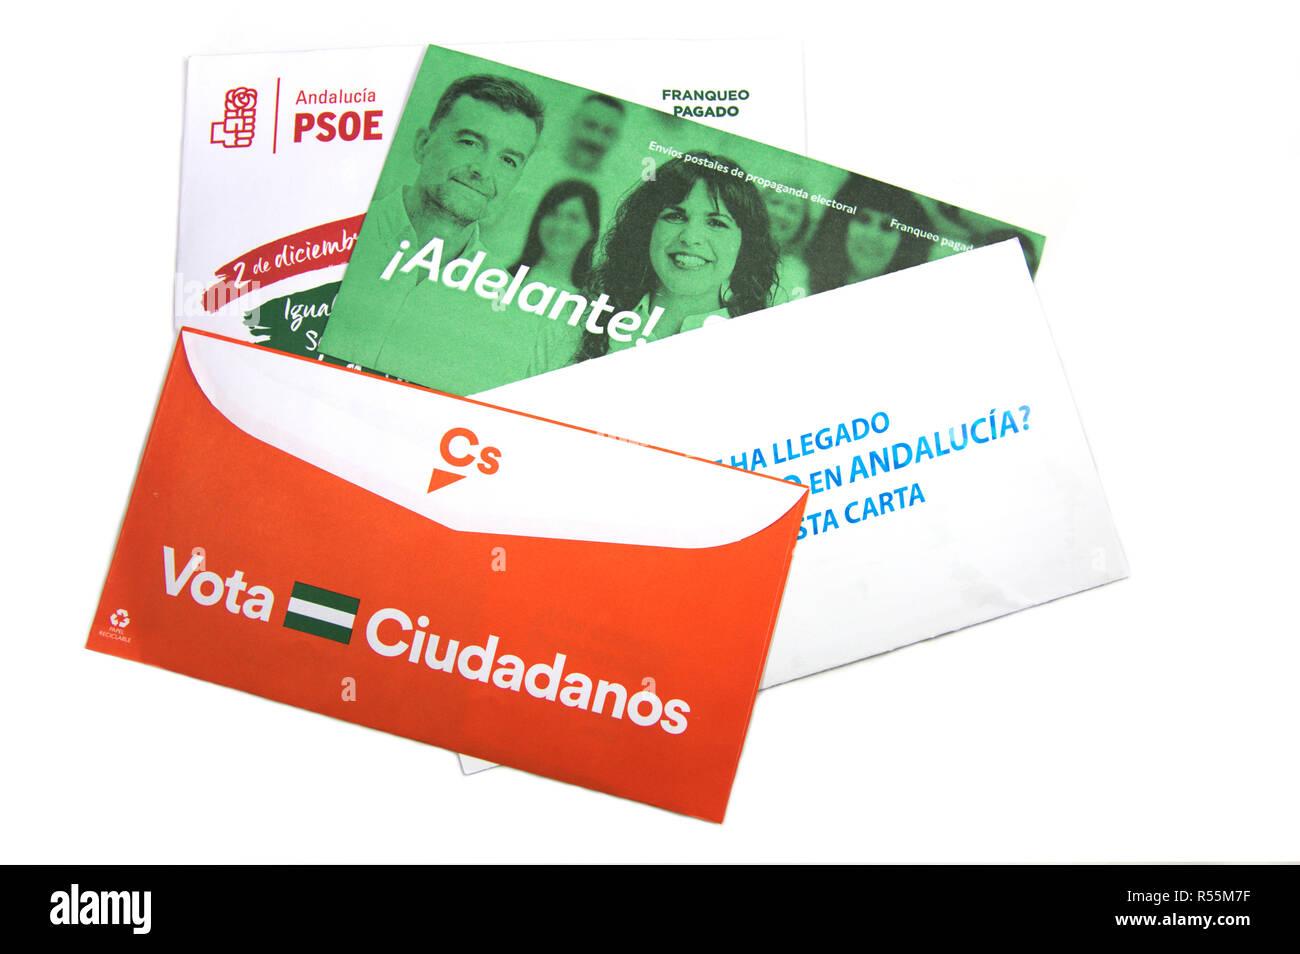 Some envelopes of electoral propaganda for the elections of the Junta de Andalucía of 2018 - Stock Image